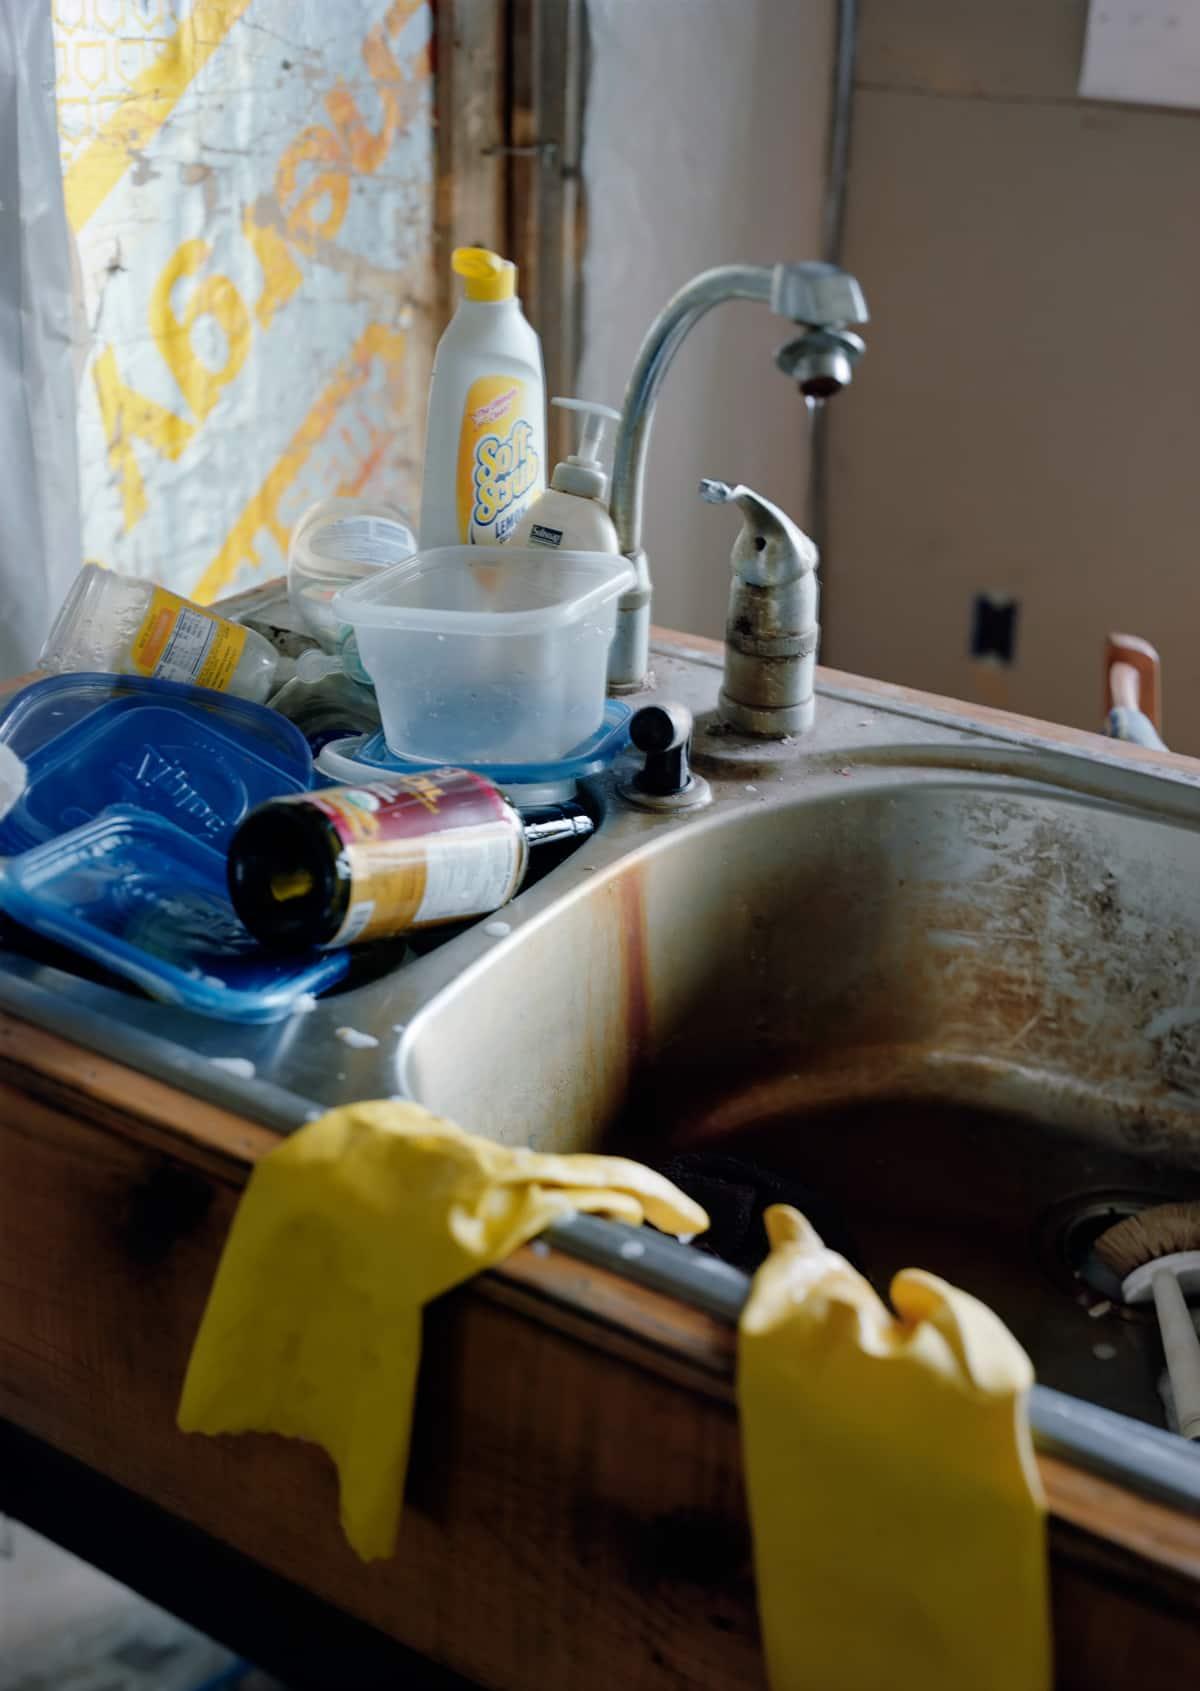 Sarah C. Butler, Frozen in Time, Yellow Gloves at Kitchen Sink, April 8 2011